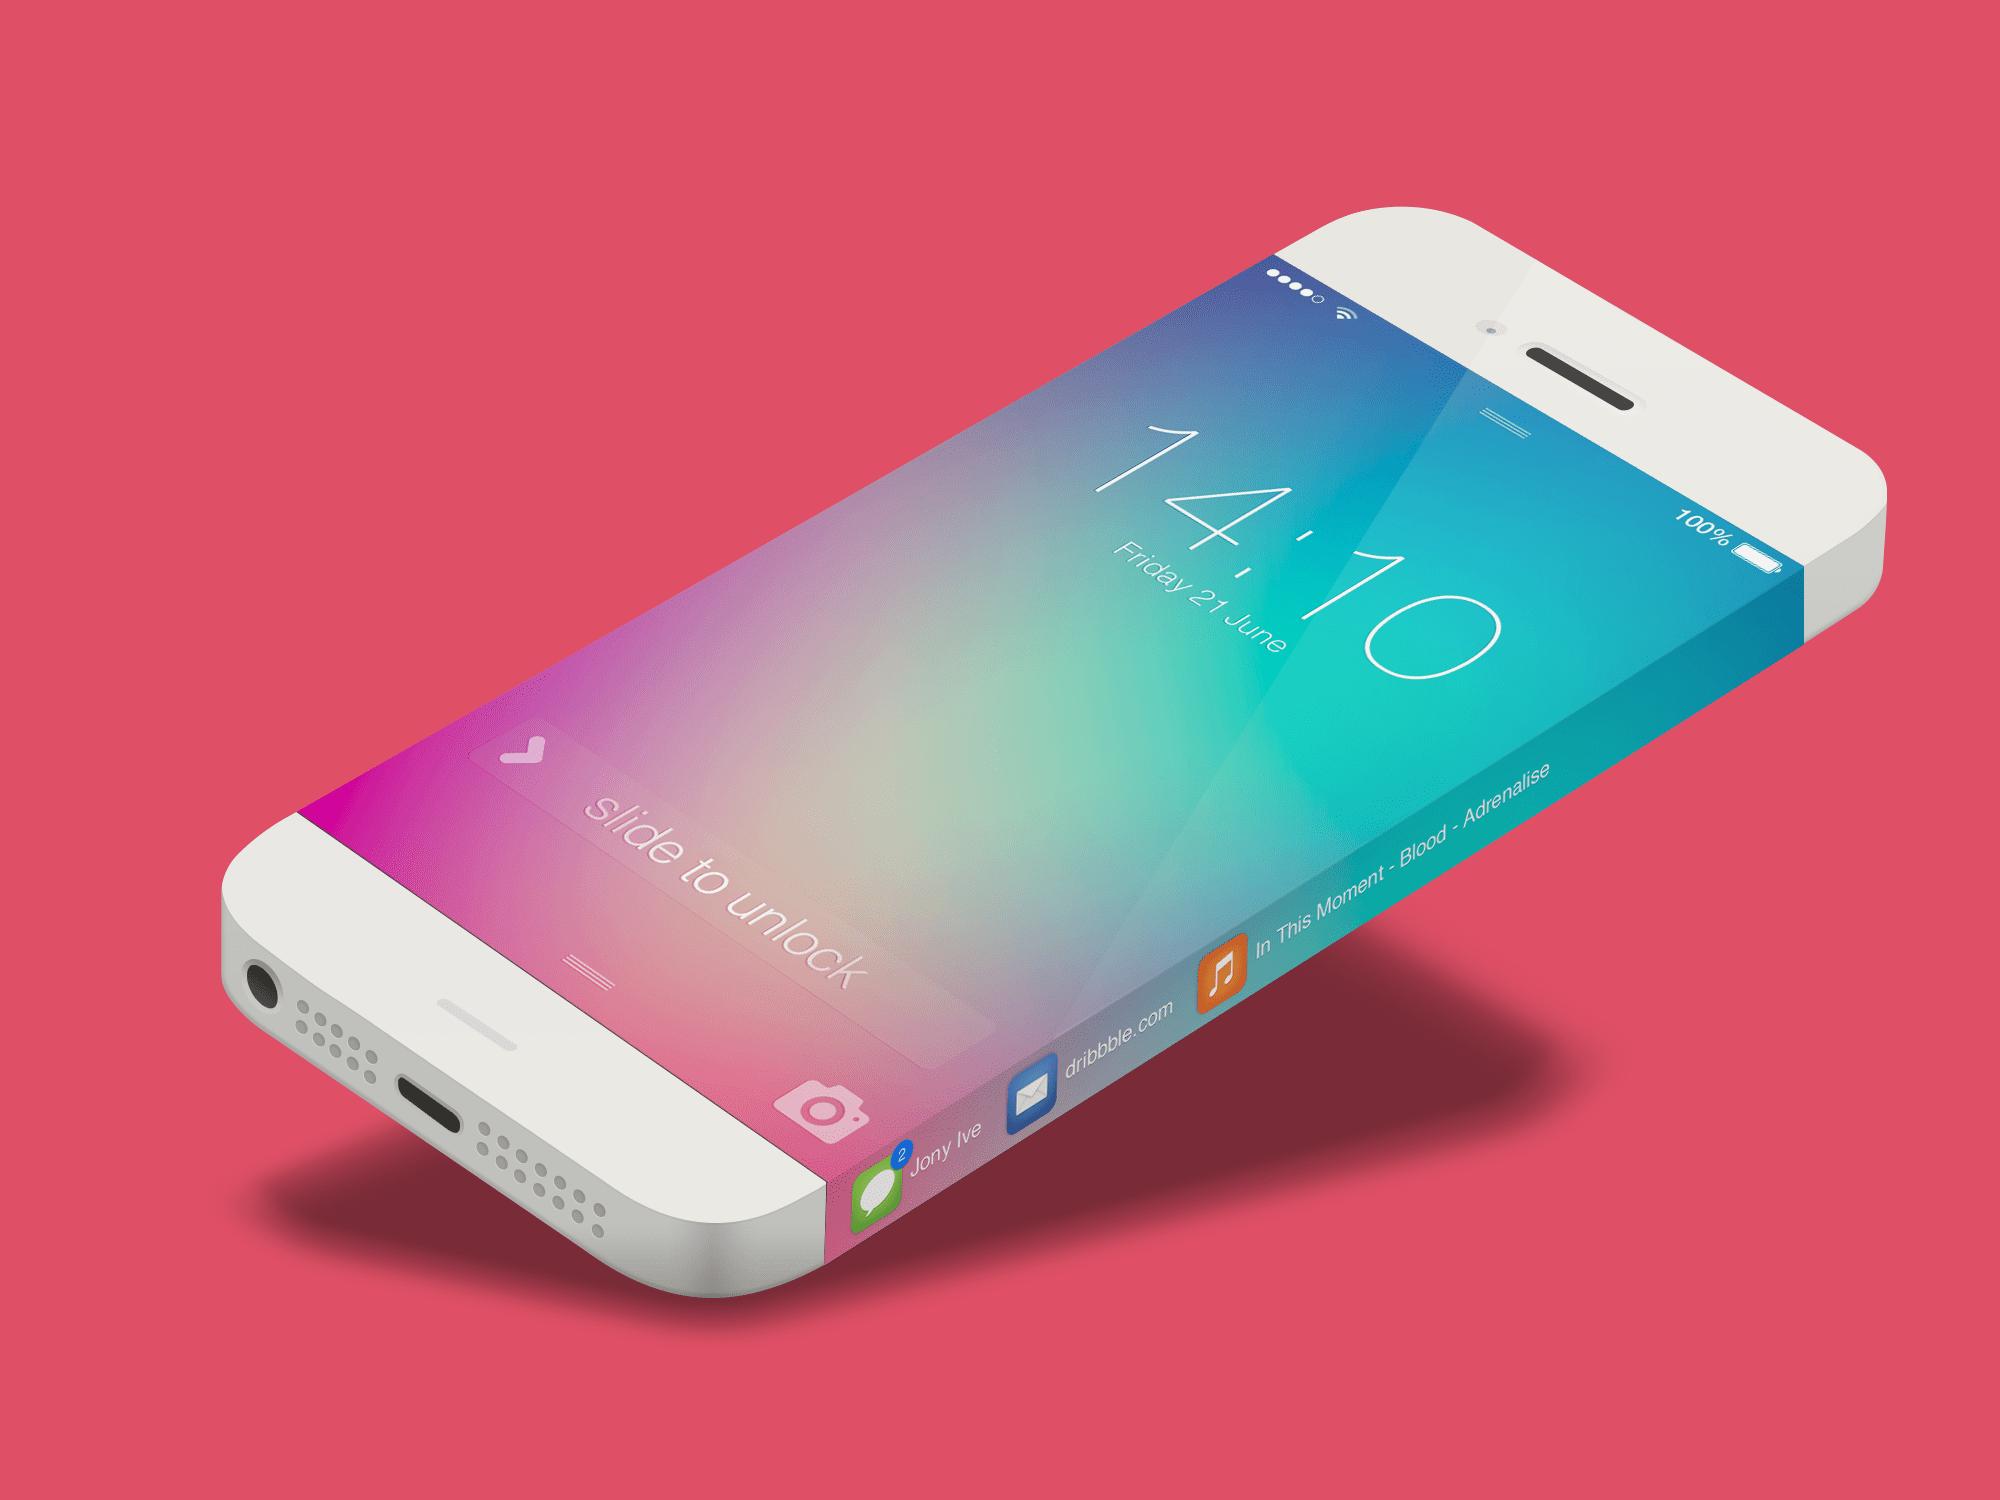 iPhone-6-endless-display-side-app-use